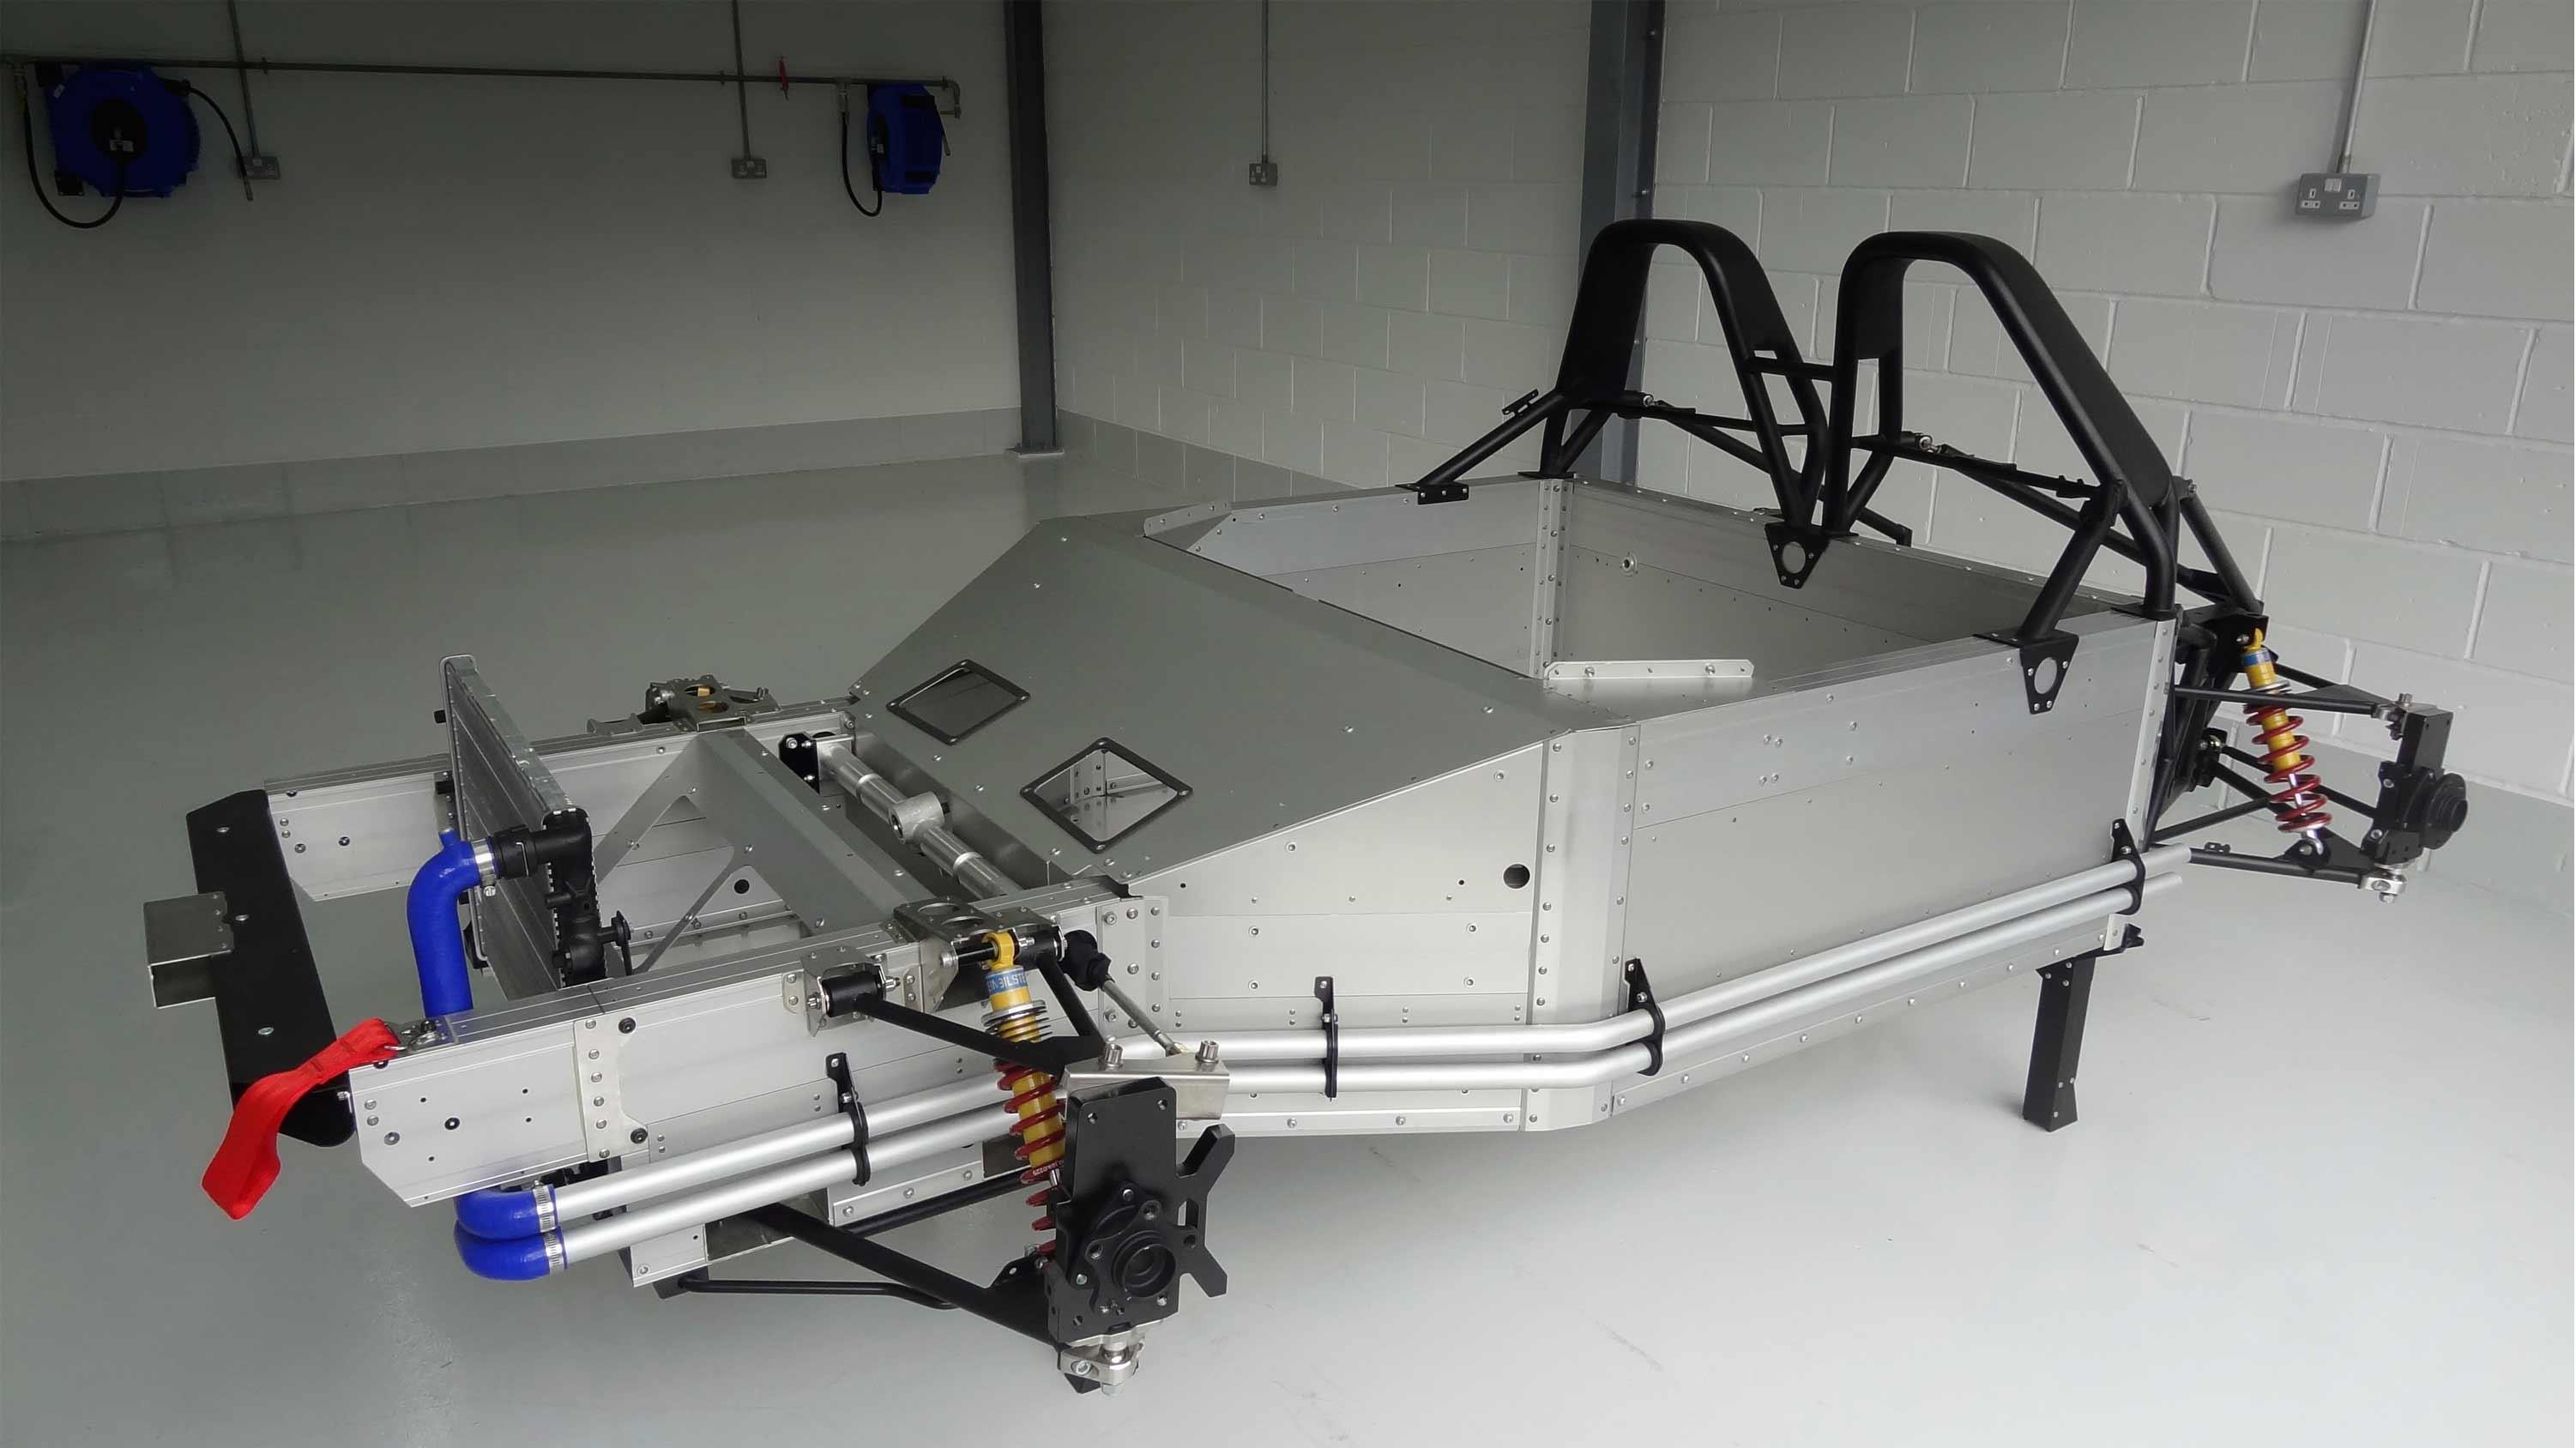 A Look At Mexico S Own Supercar The Vuhl 05